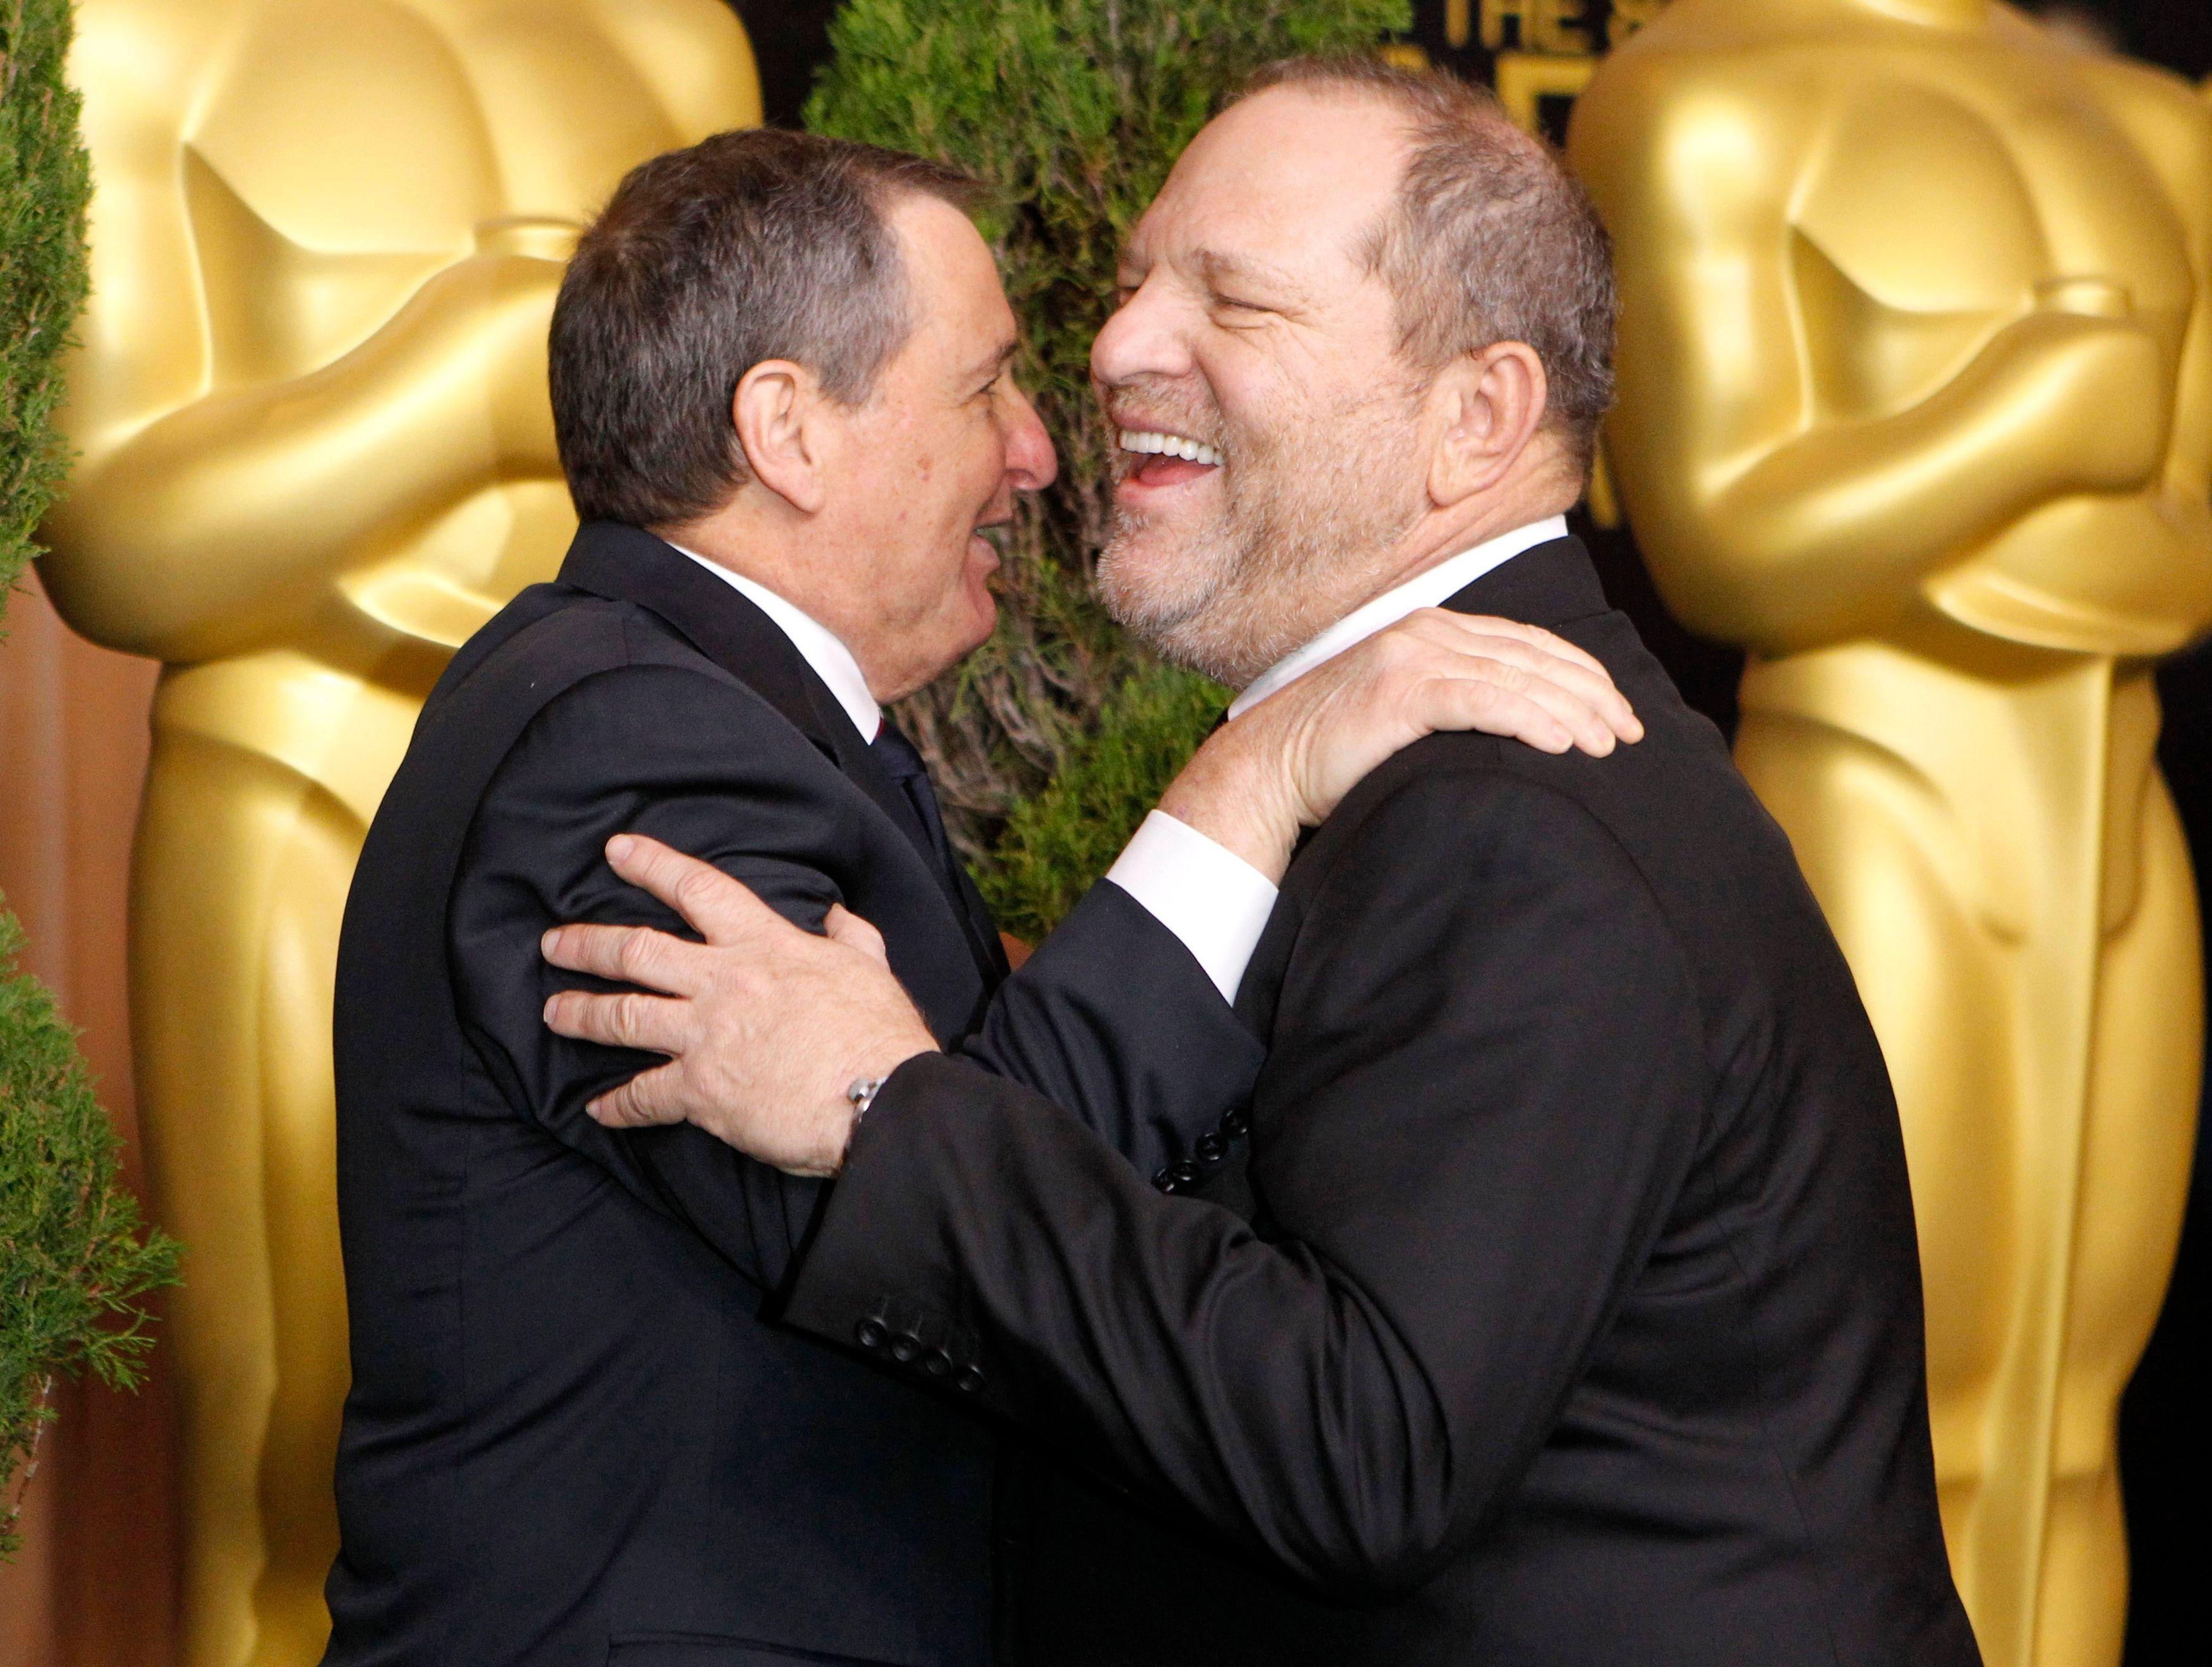 Affaire Weinstein : le glaçant scandale sexuel qui accable Hollywood